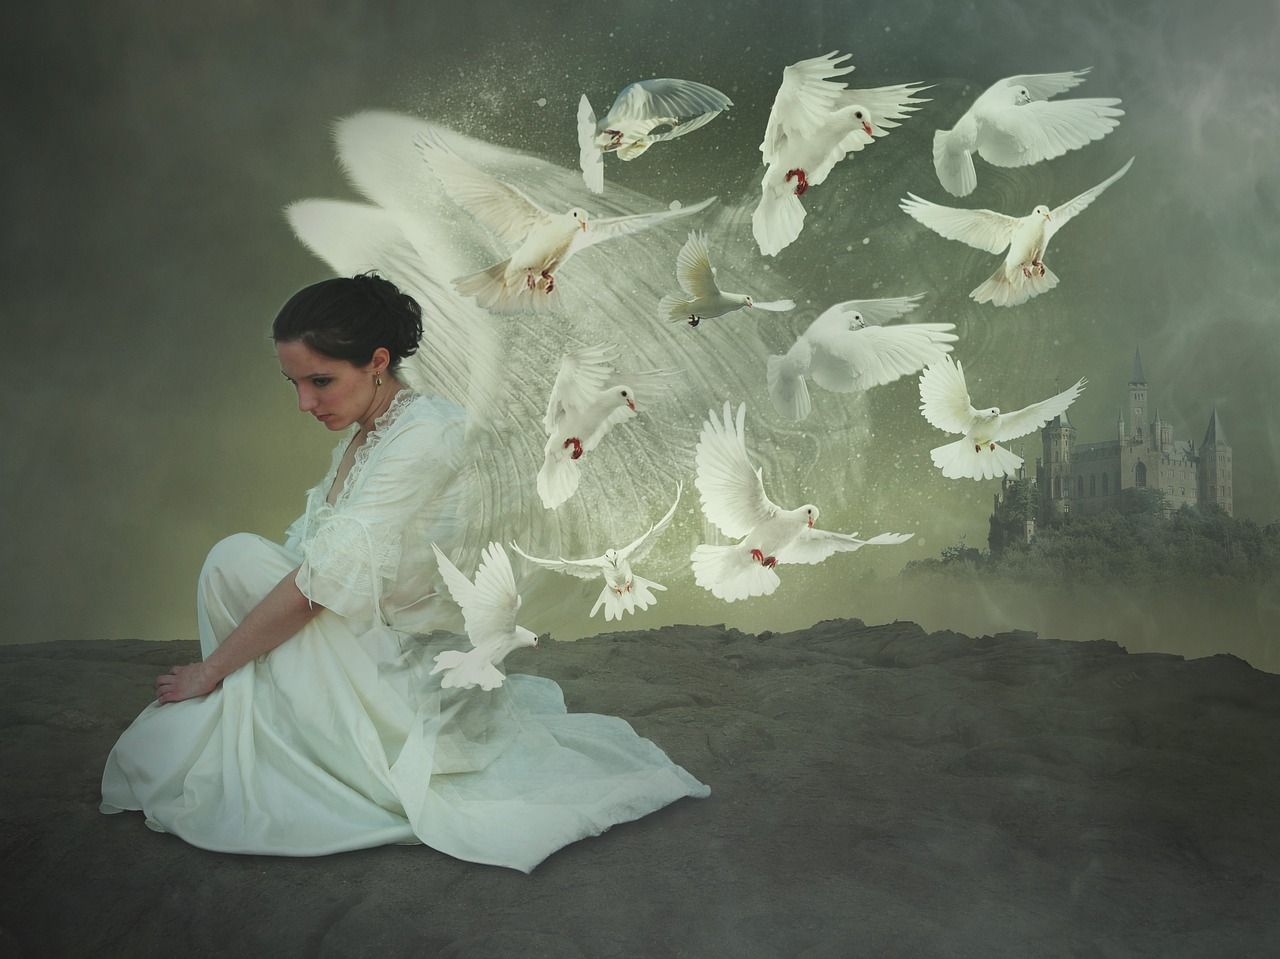 Wing-Angel-Sad-Fee-Woman-Adult-Fantasy-Human